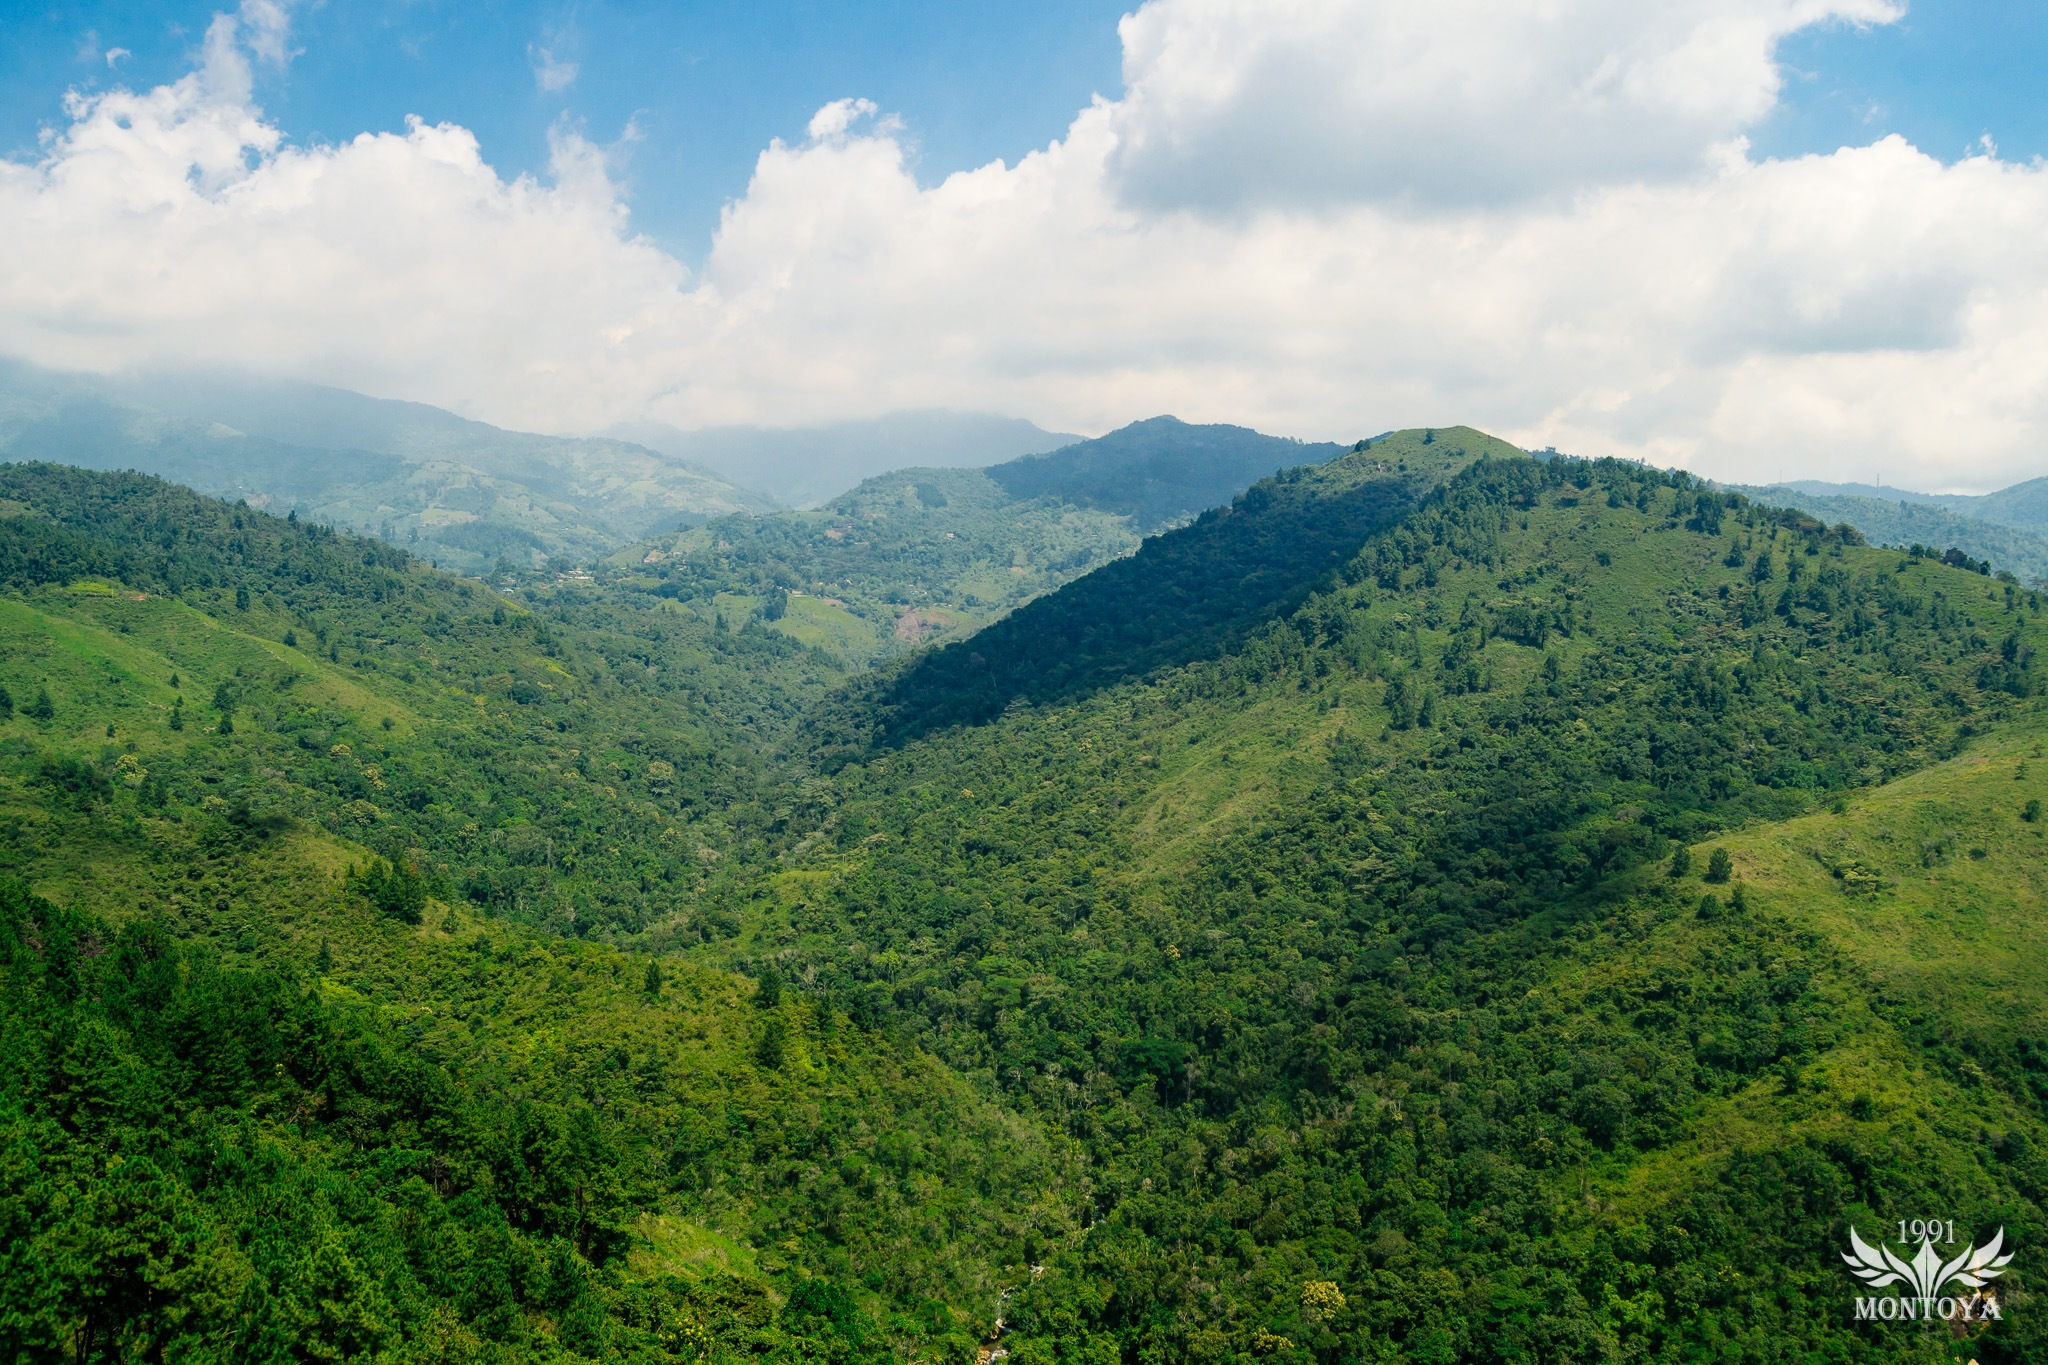 bosques del valle by David Montoya